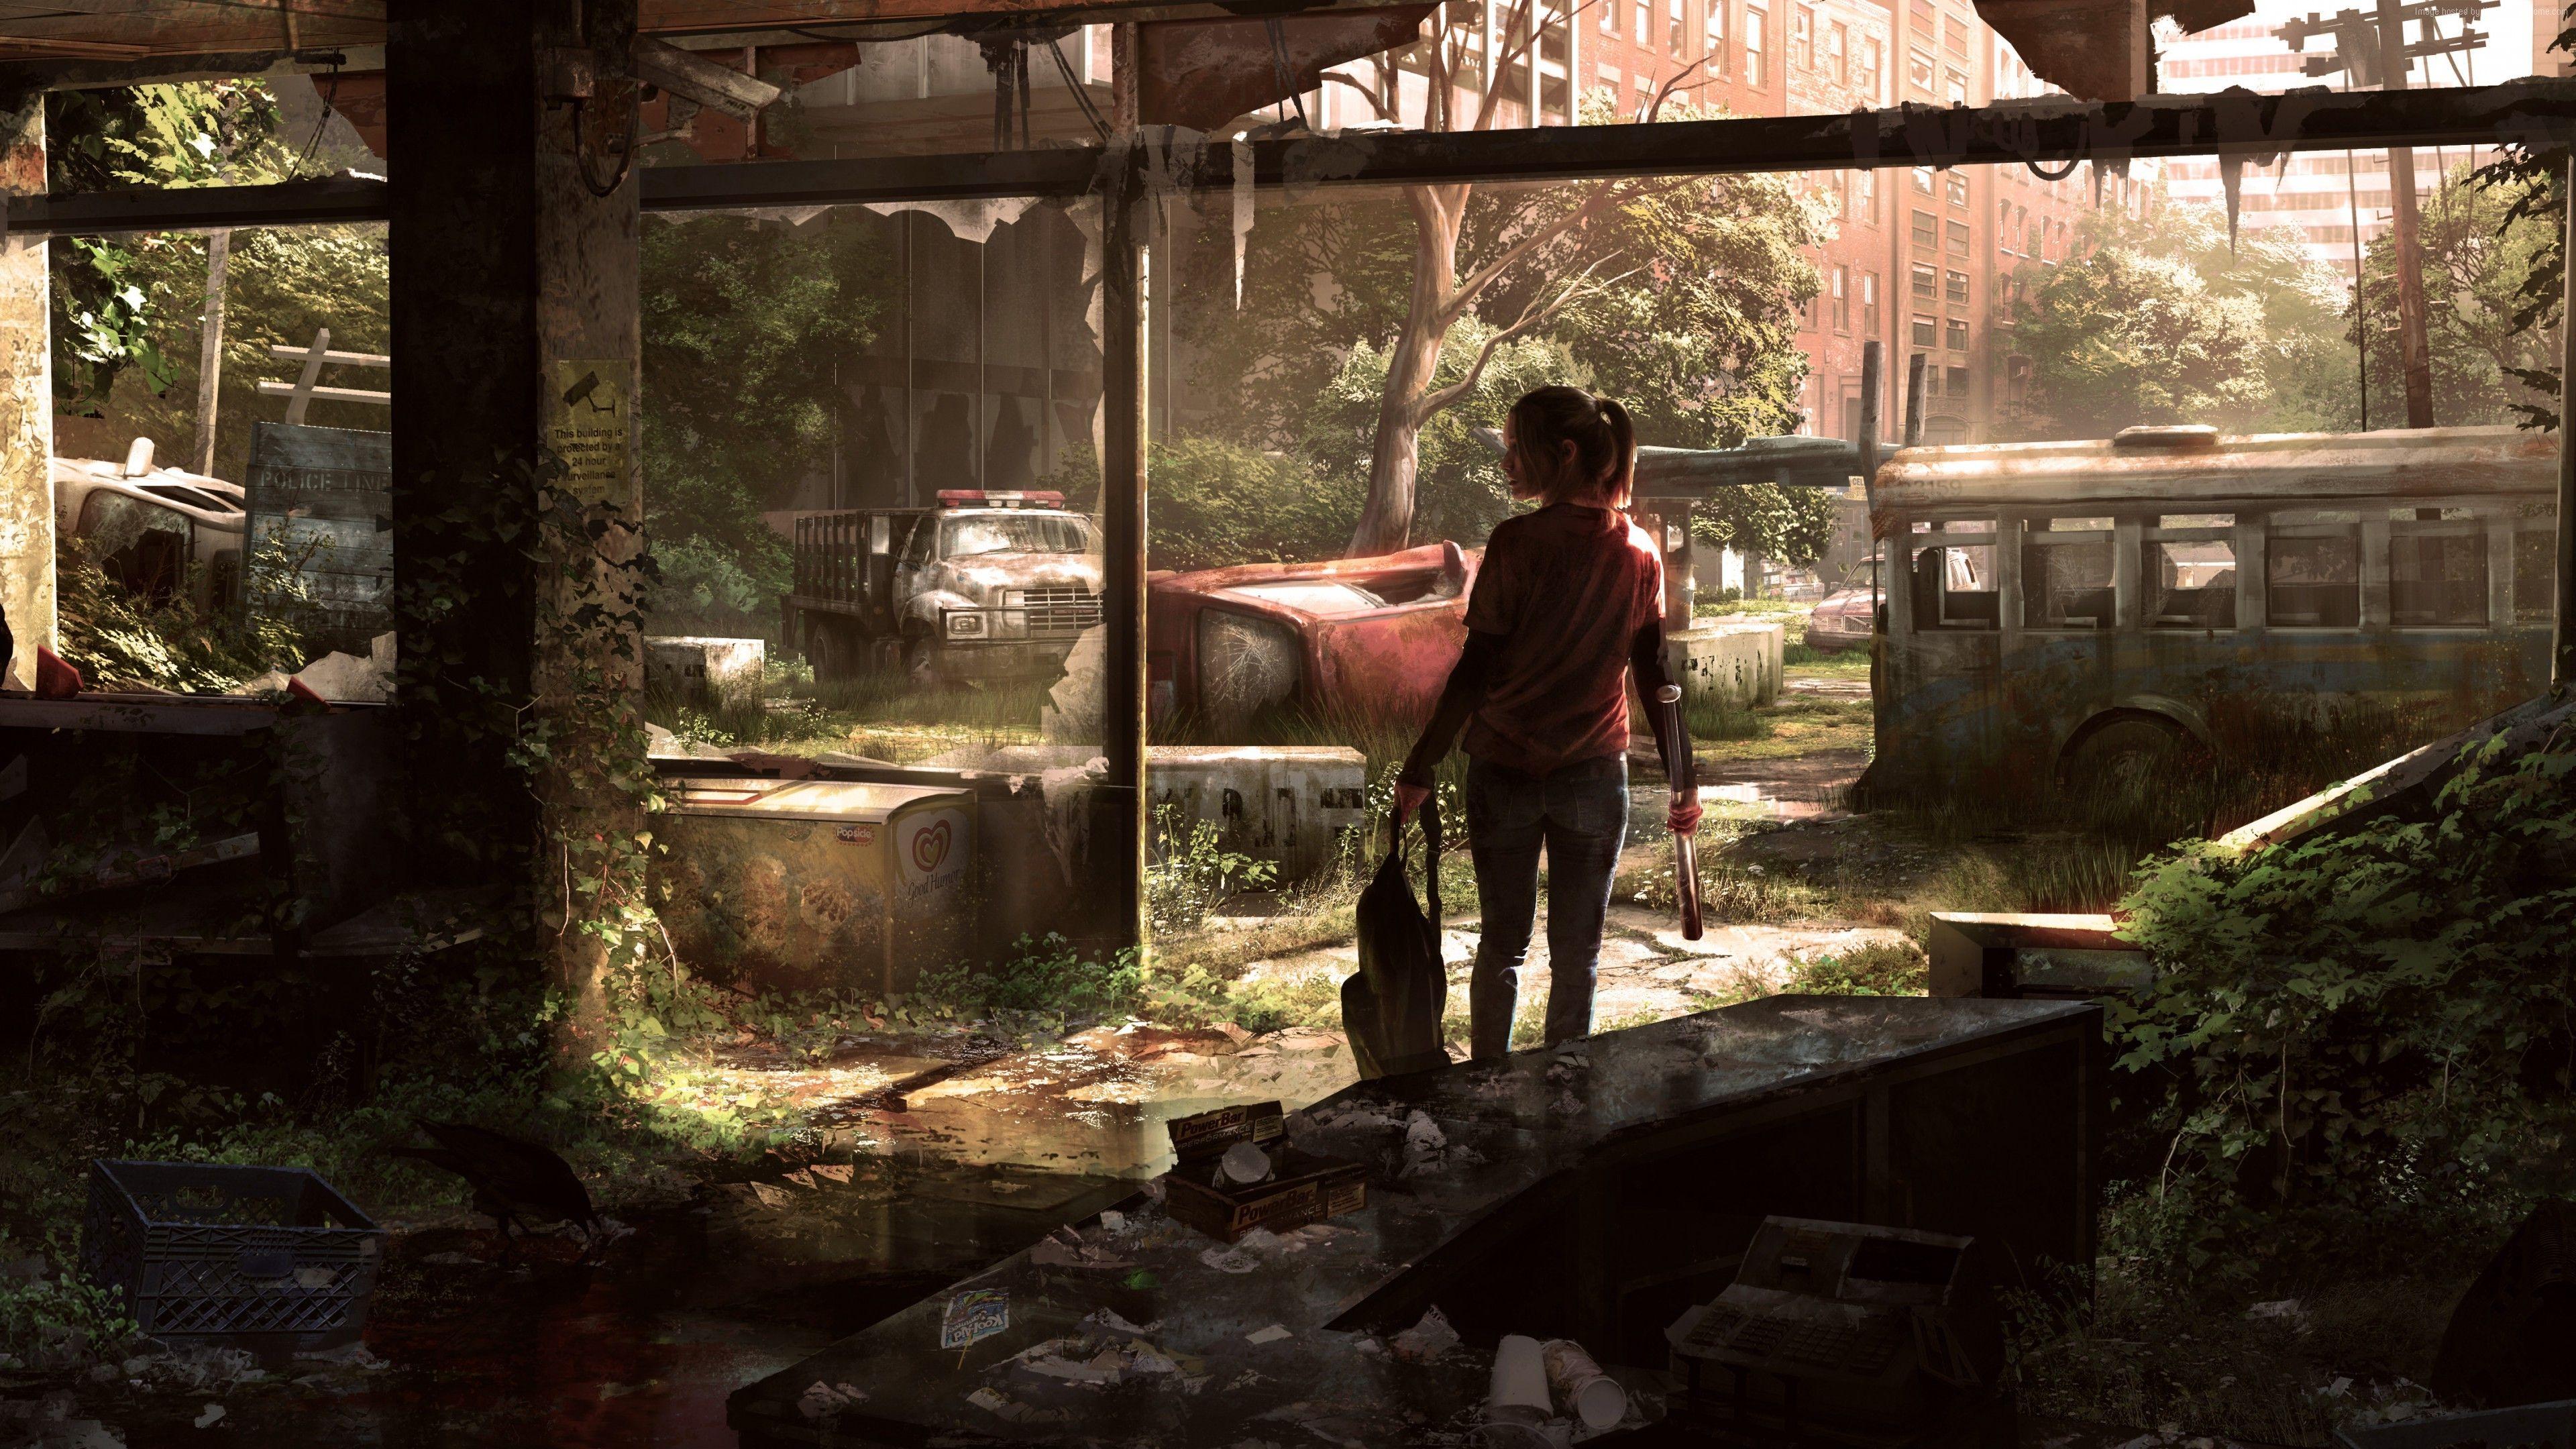 Wallpaper 4k The Last Of Us Video Game 4k 4k Wallpapers Games